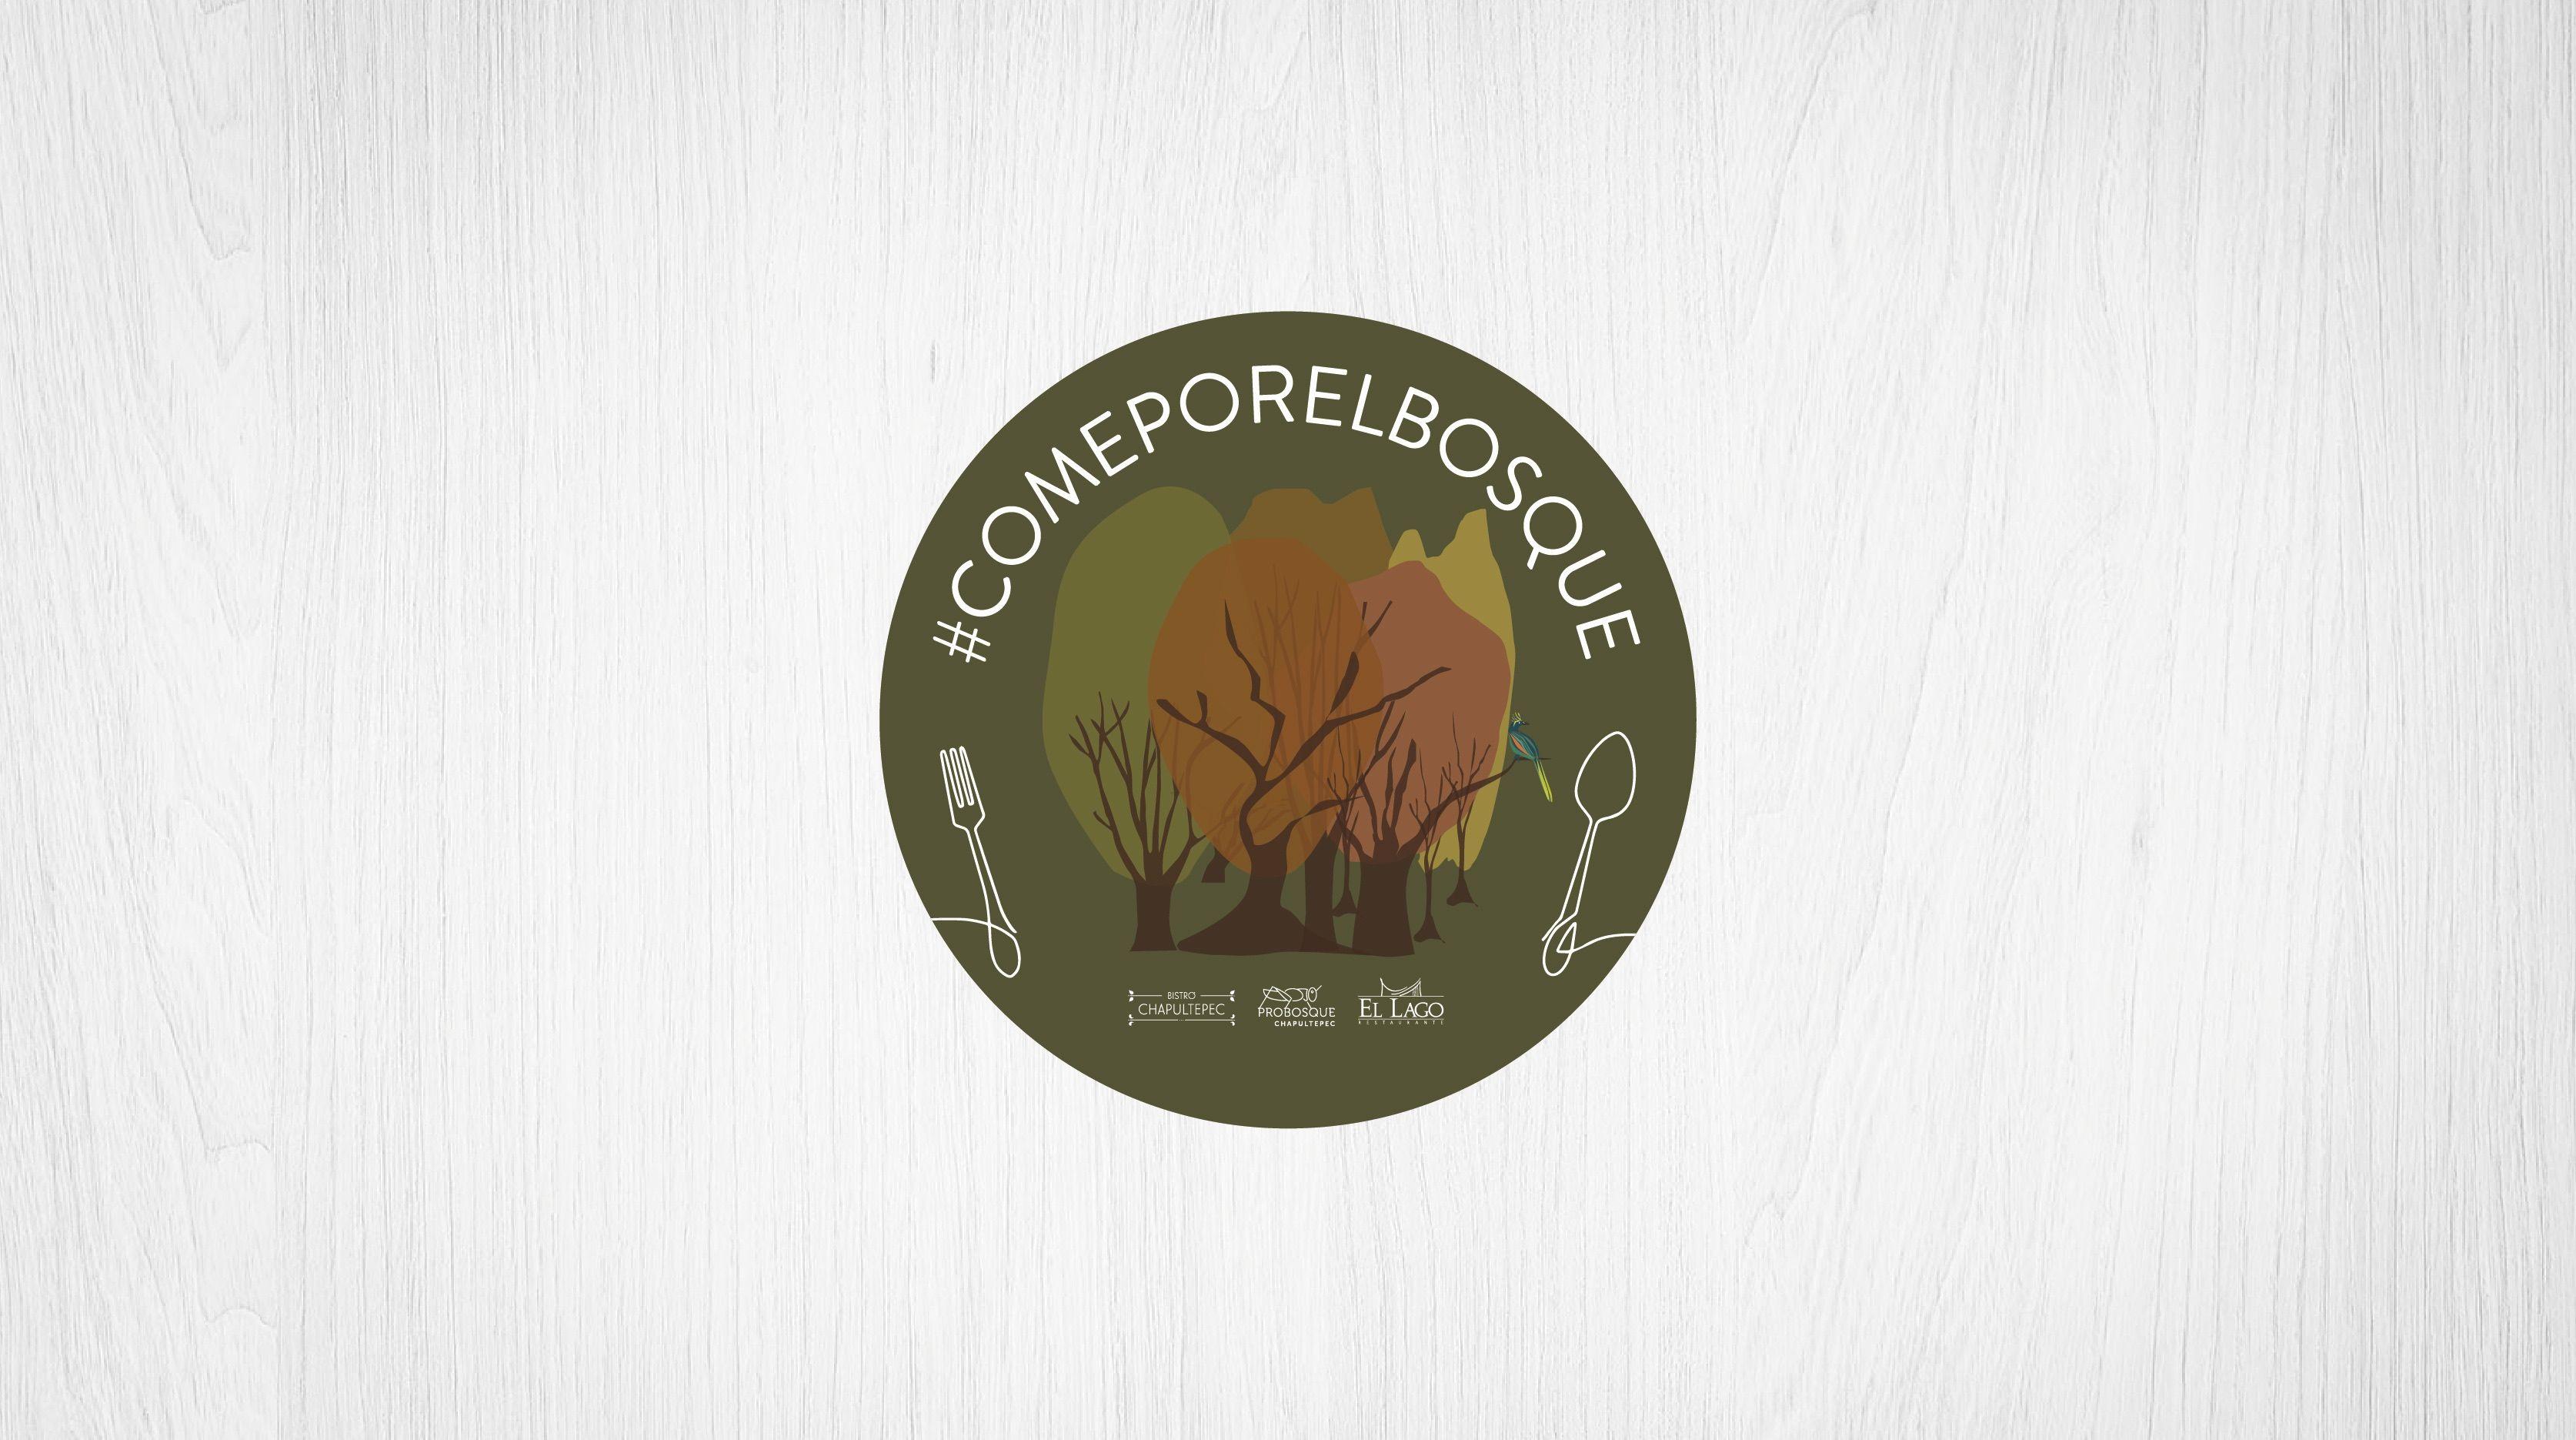 Foto de Alianza CMR - Pro Bosque